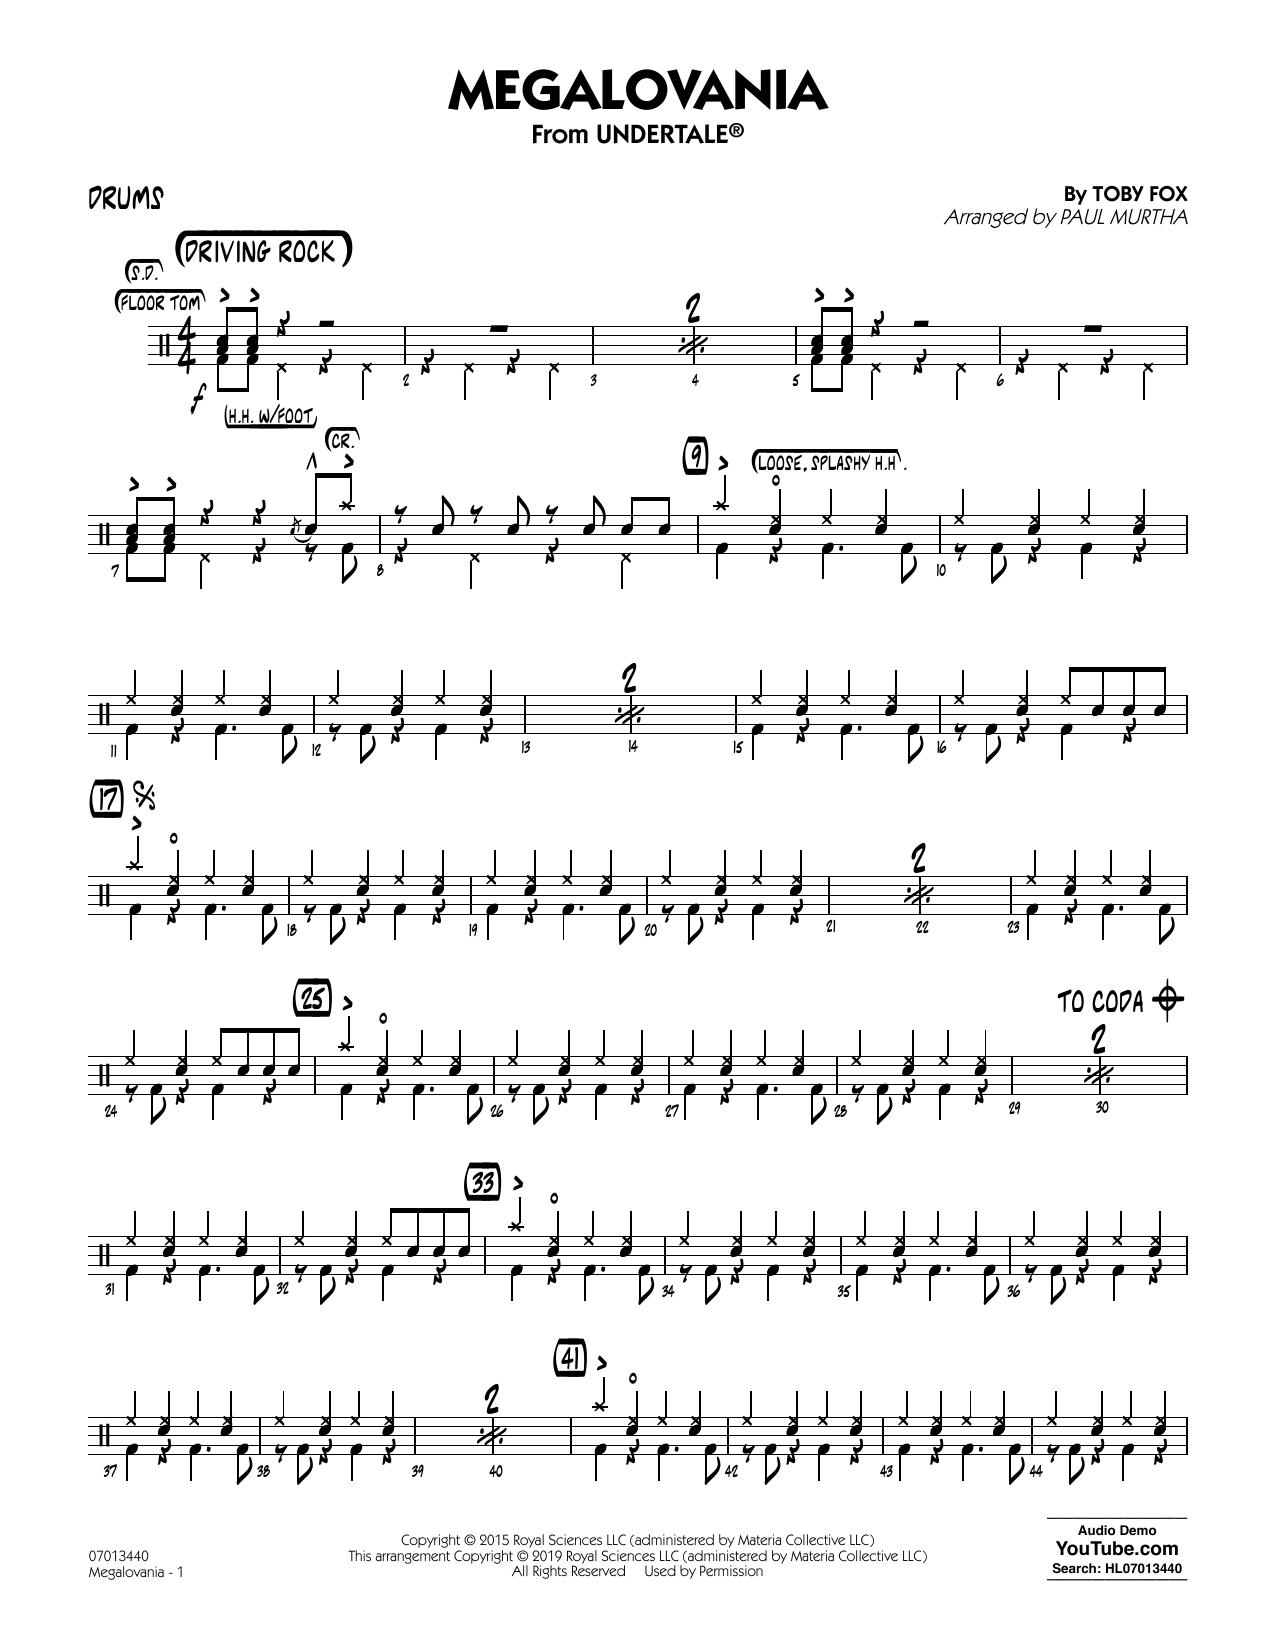 Megalovania (arr  Paul Murtha) - Drums by Toby Fox Jazz Ensemble Digital  Sheet Music